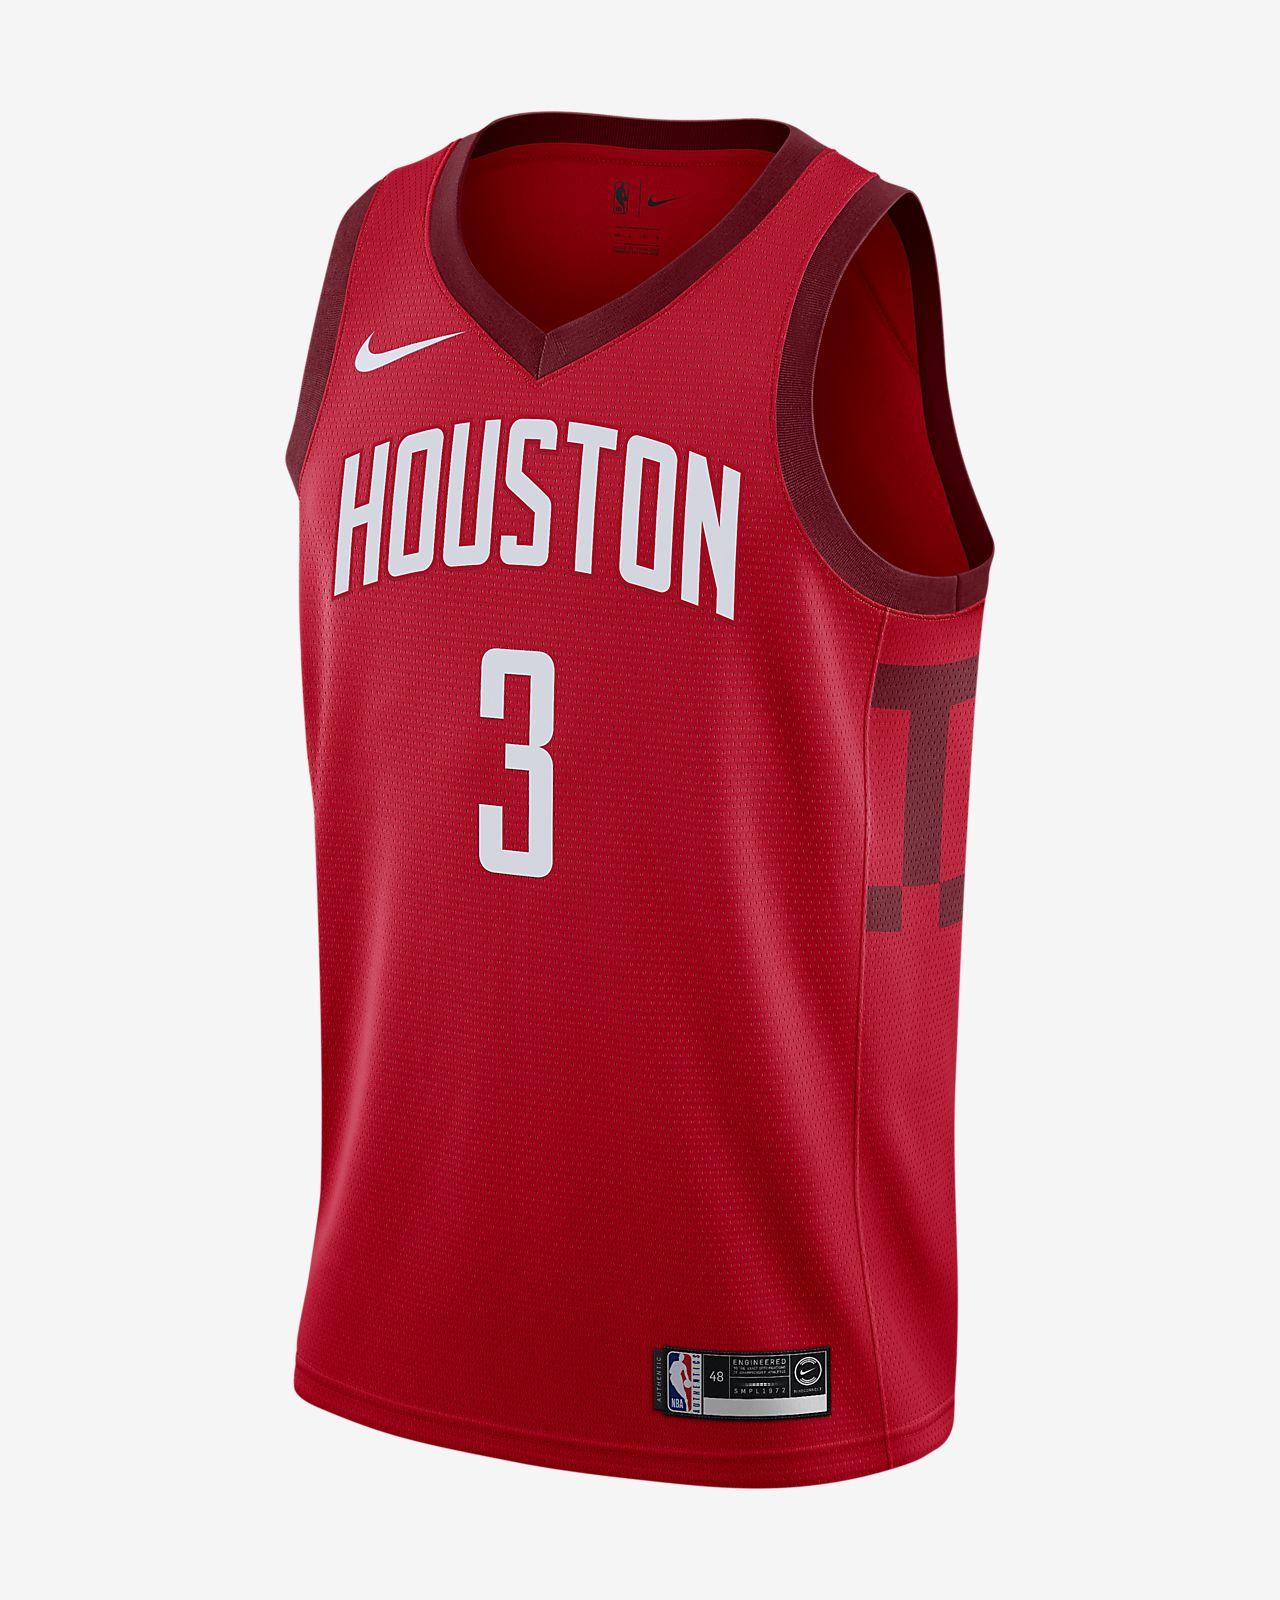 Camiseta conectada Nike NBA para hombre Chris Paul Earned Statement Edition Swingman (Houston Rockets)